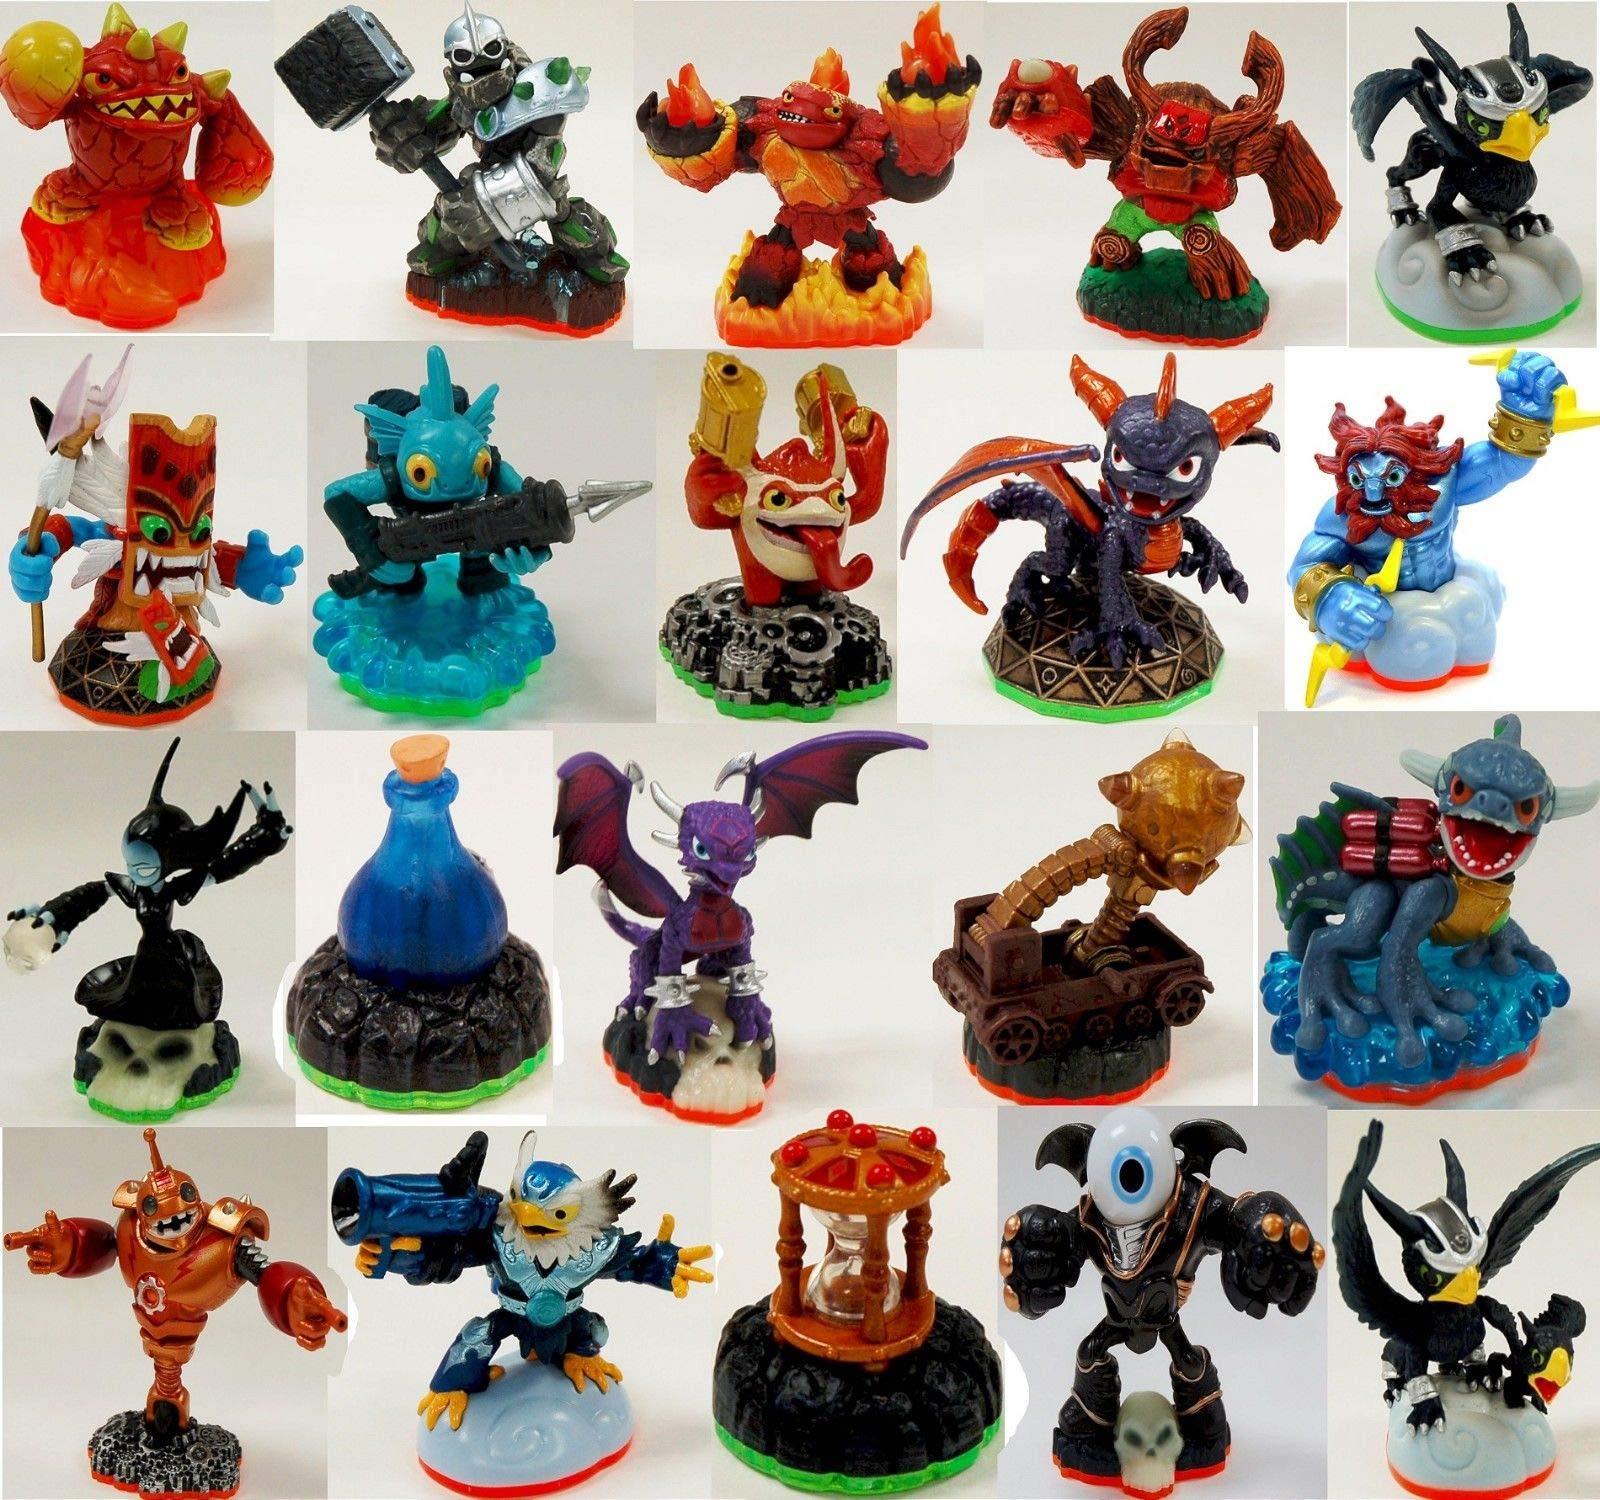 20 x NEW BULK LOT Skylanders Figure Spyro Swap Force Giants Wii-U 3DS PS4 PS3 XBox 360